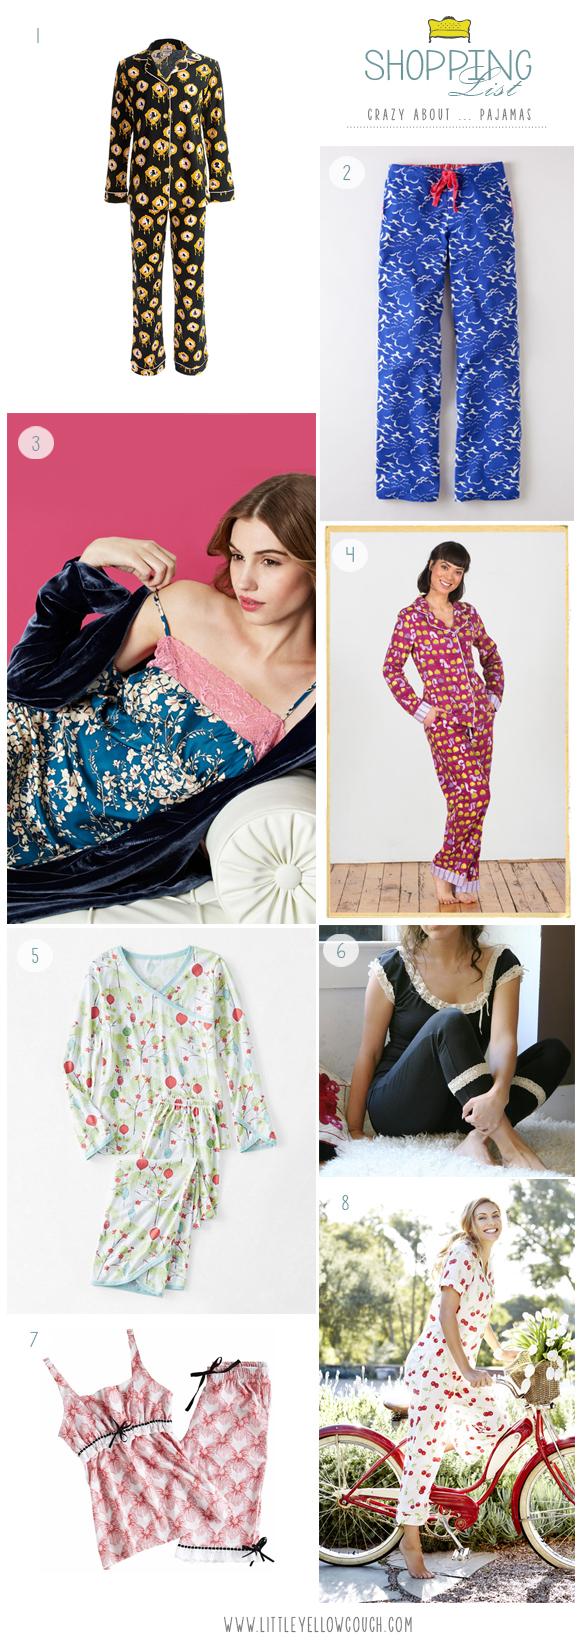 pajamasshoppinglist.jpg